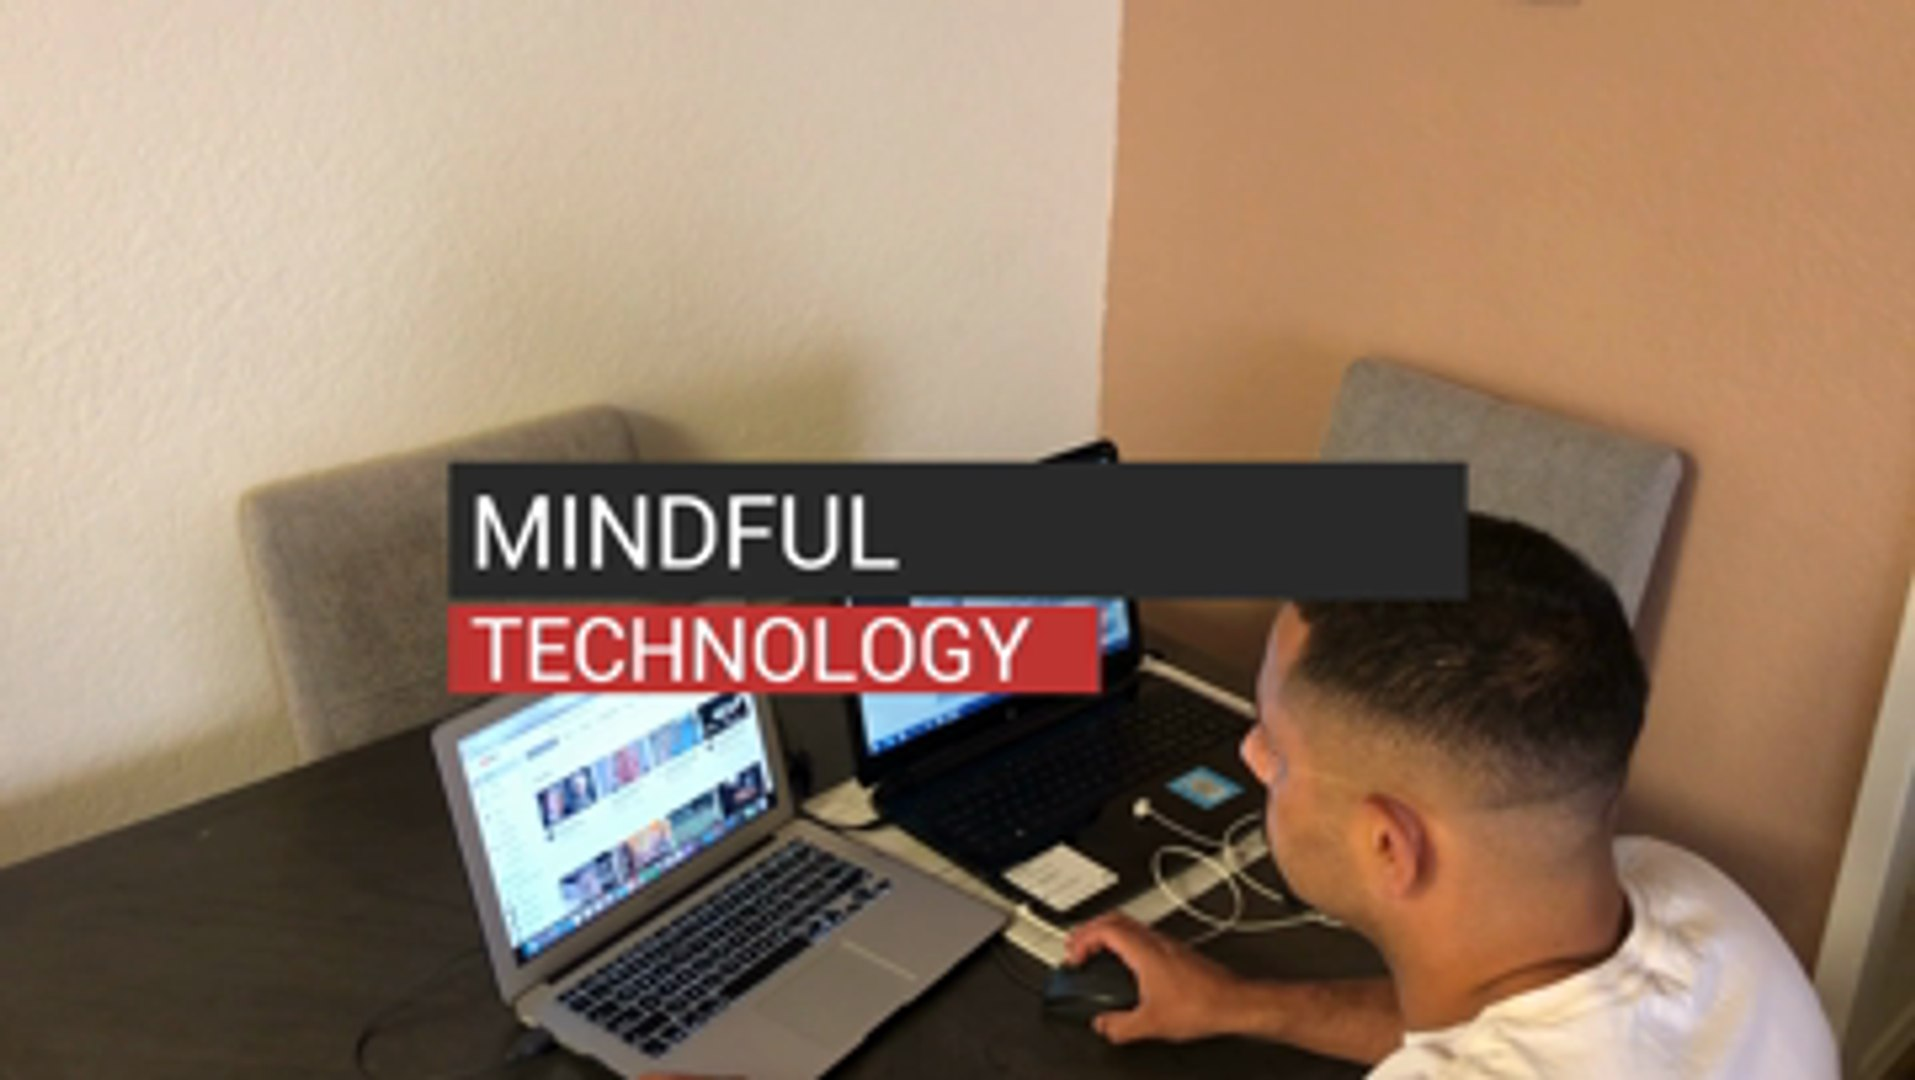 Mindful Technology